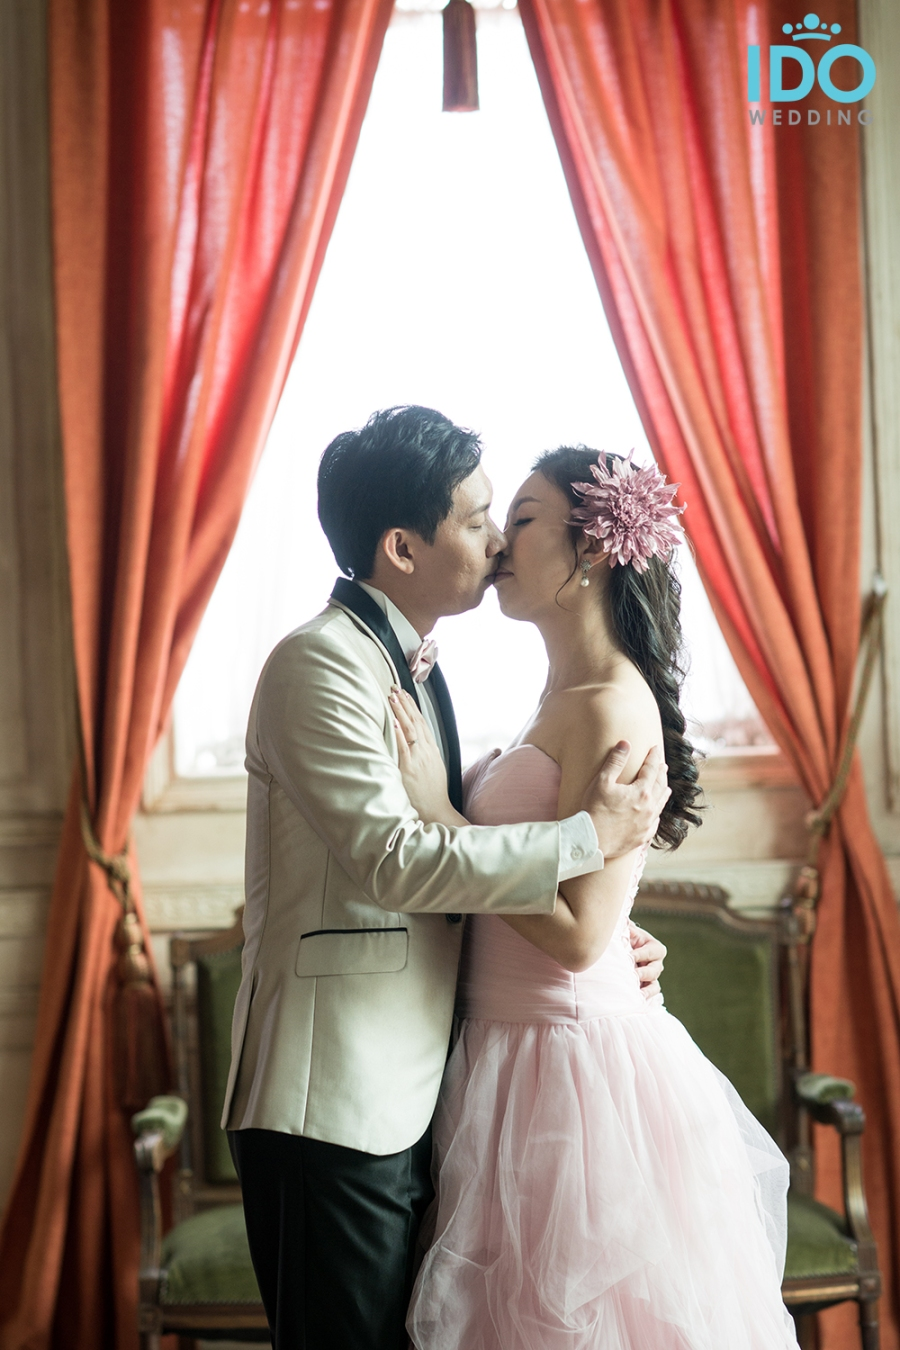 koreanweddingphotography_DSC00356 copy